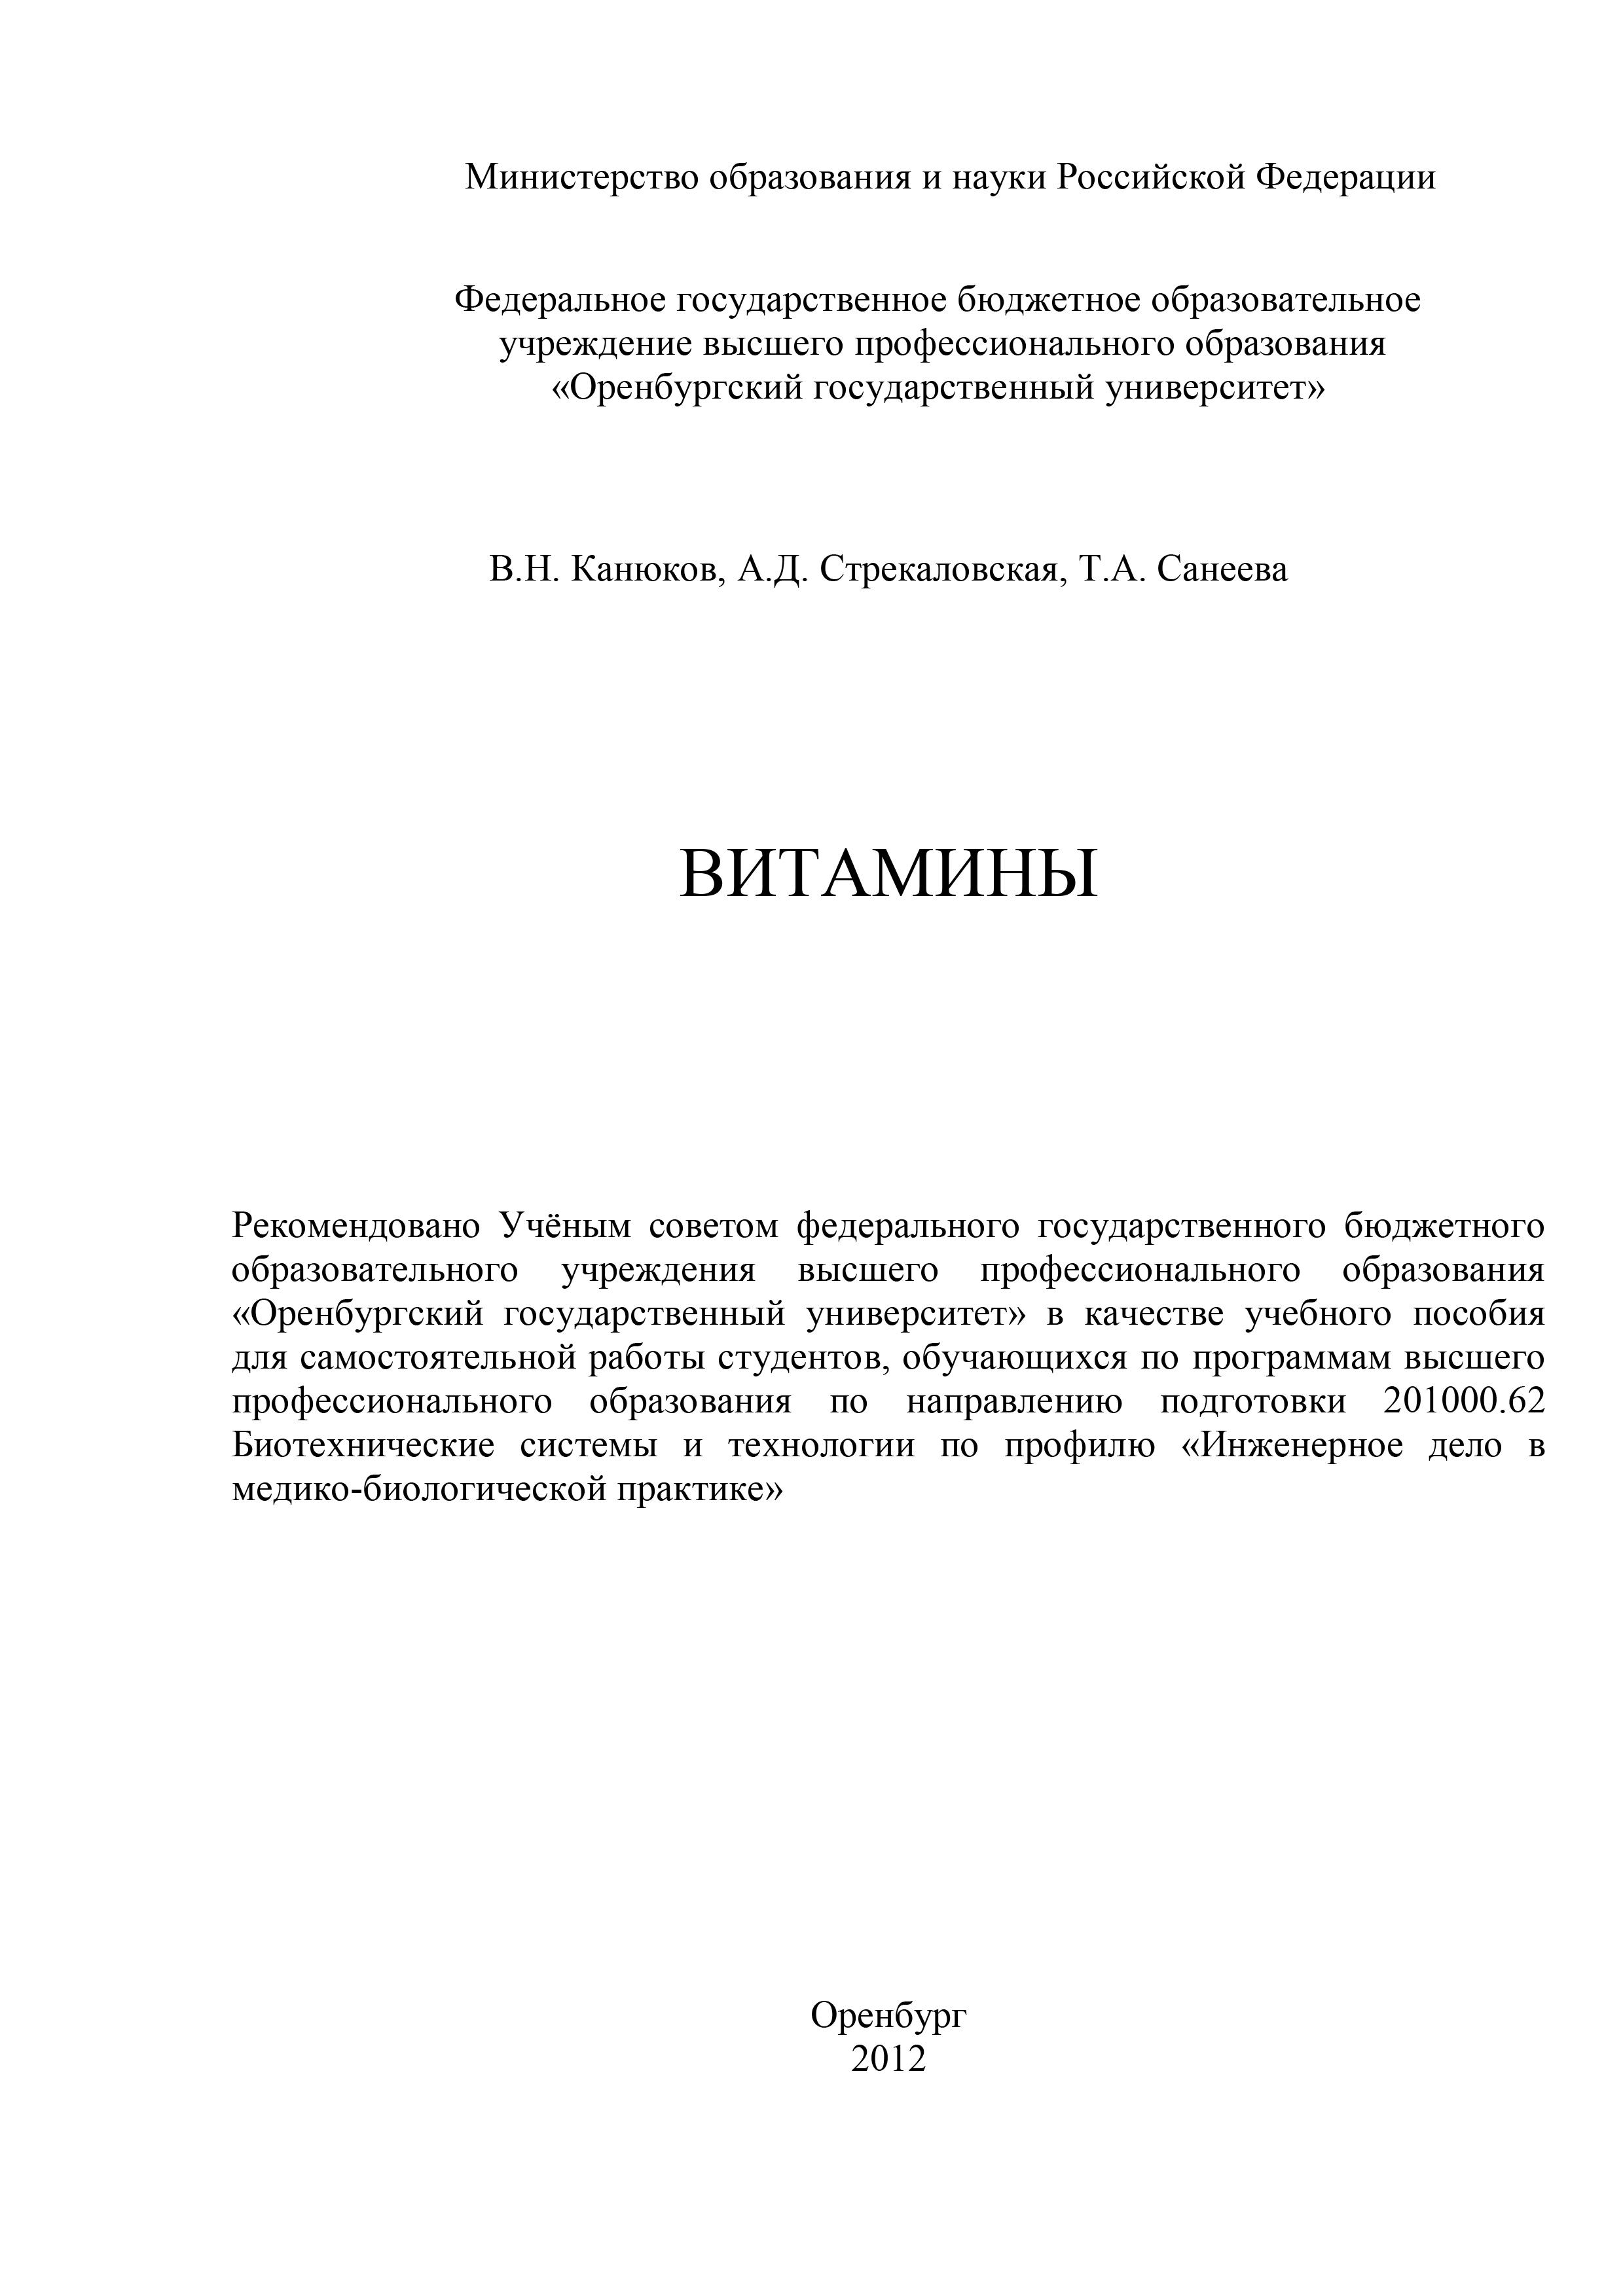 В. Н. Канюков Витамины витамины амвей